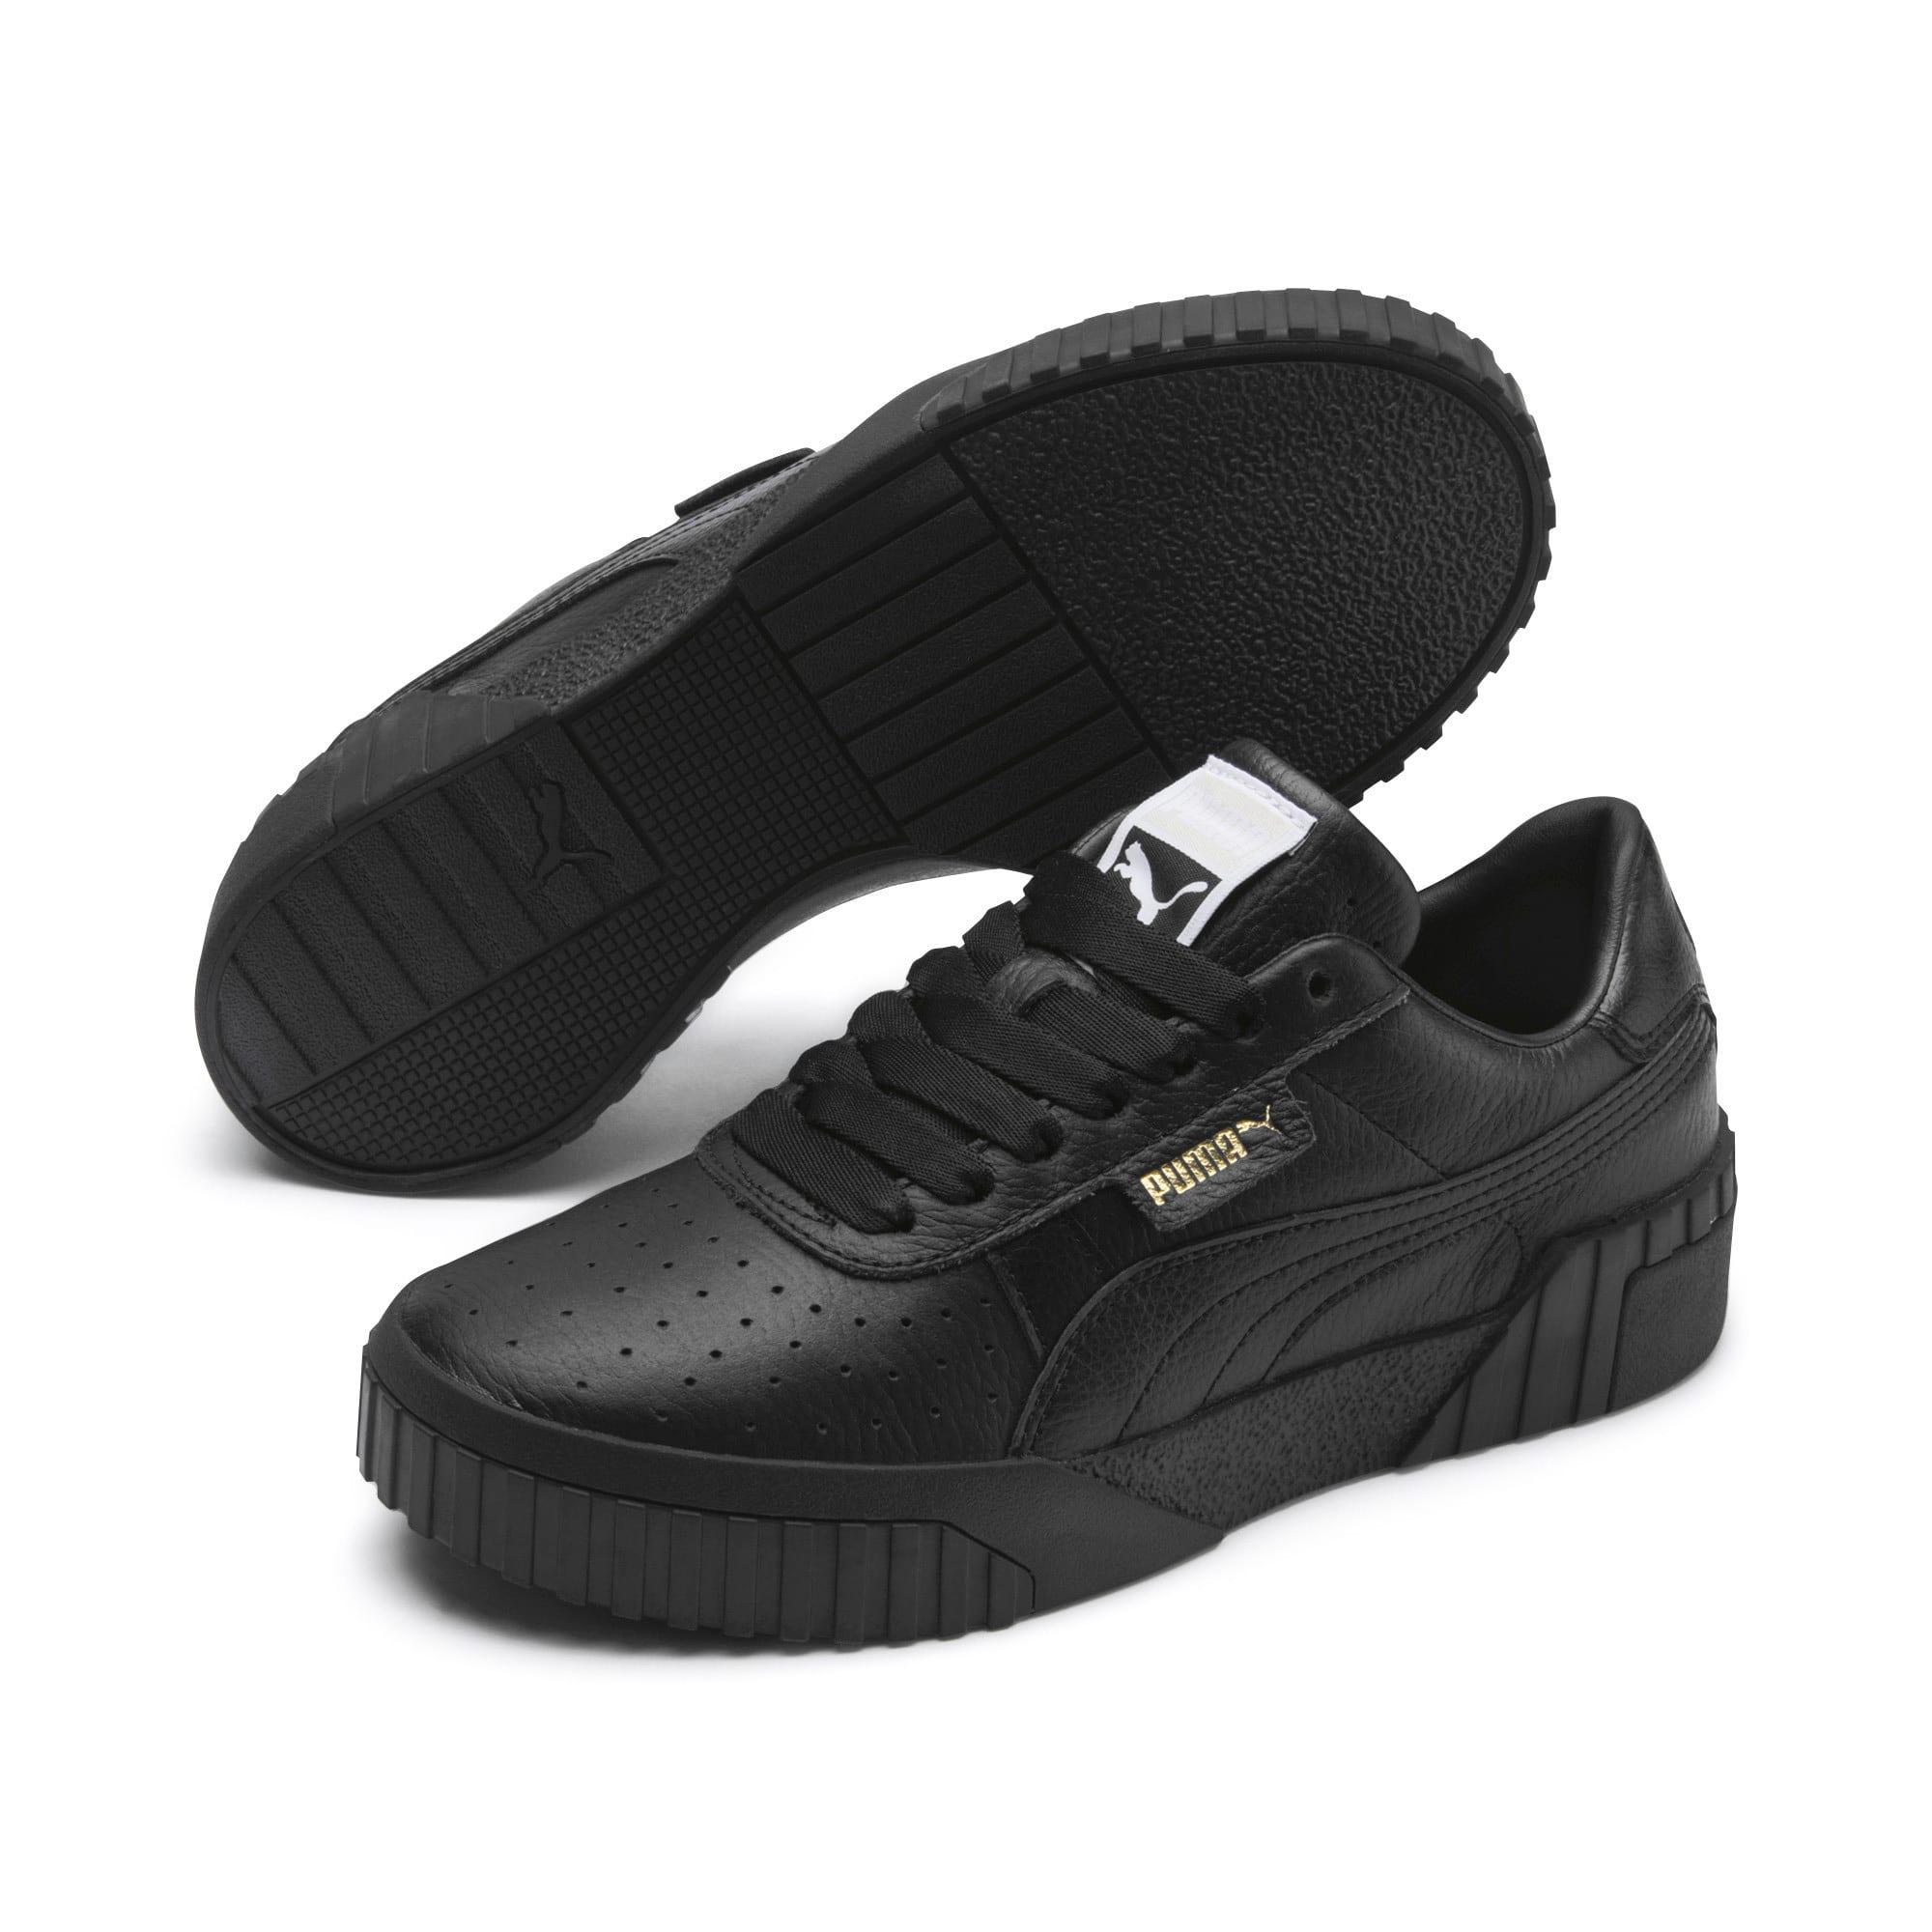 Thumbnail 3 of Sneakers Cali donna, Puma Black-Puma Black, medium